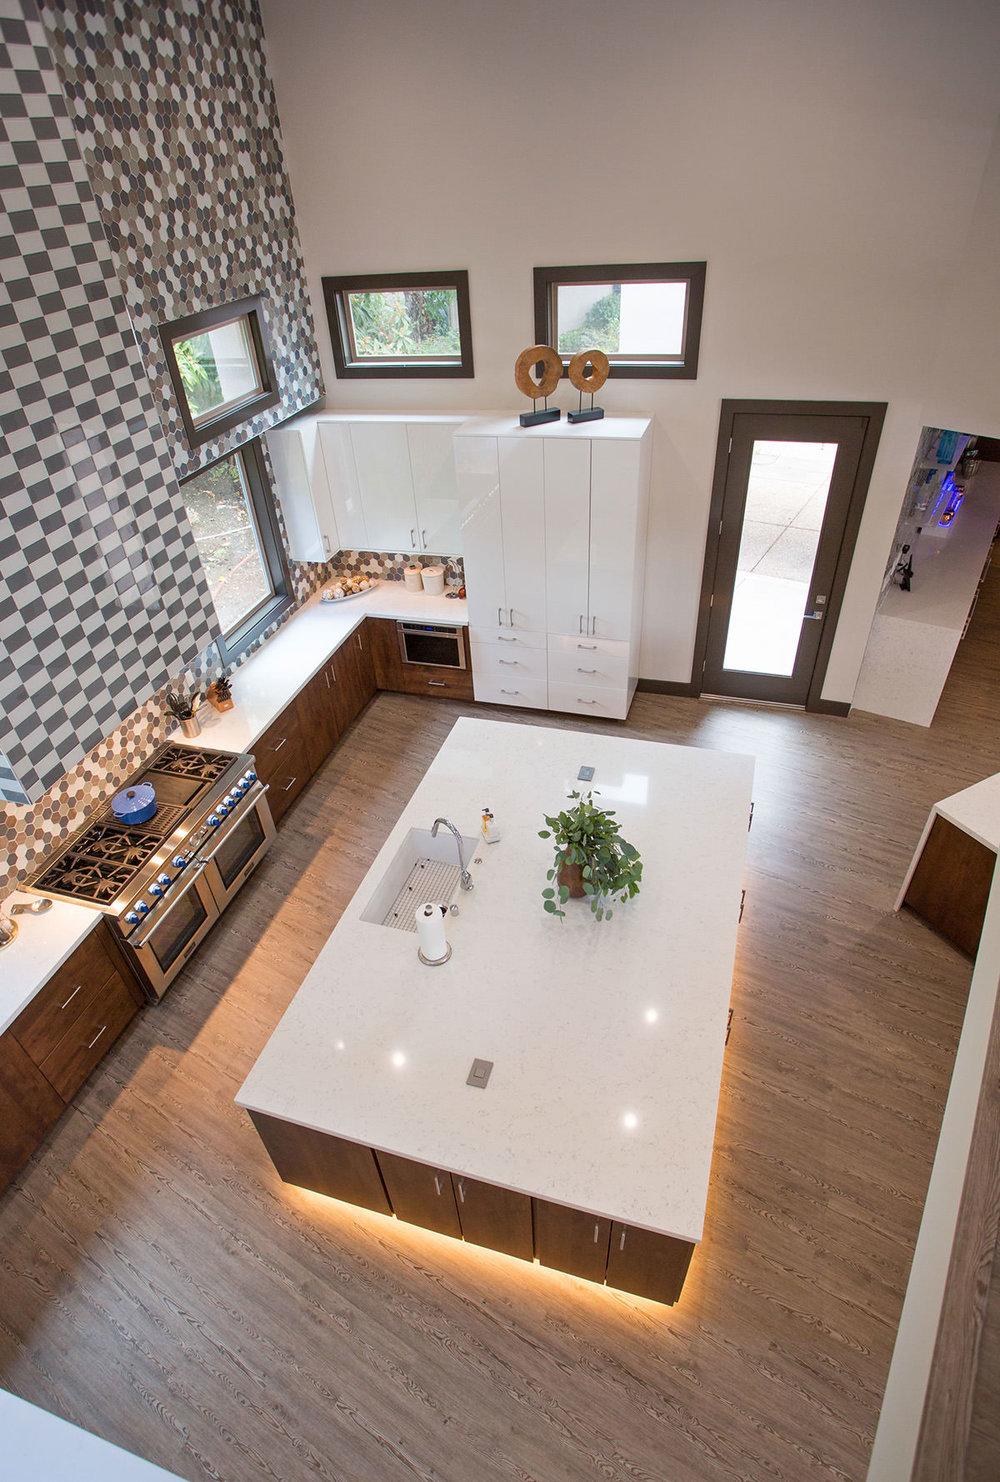 kitchen-interior-design-los-altos-california-ktj-design-co-12.jpg